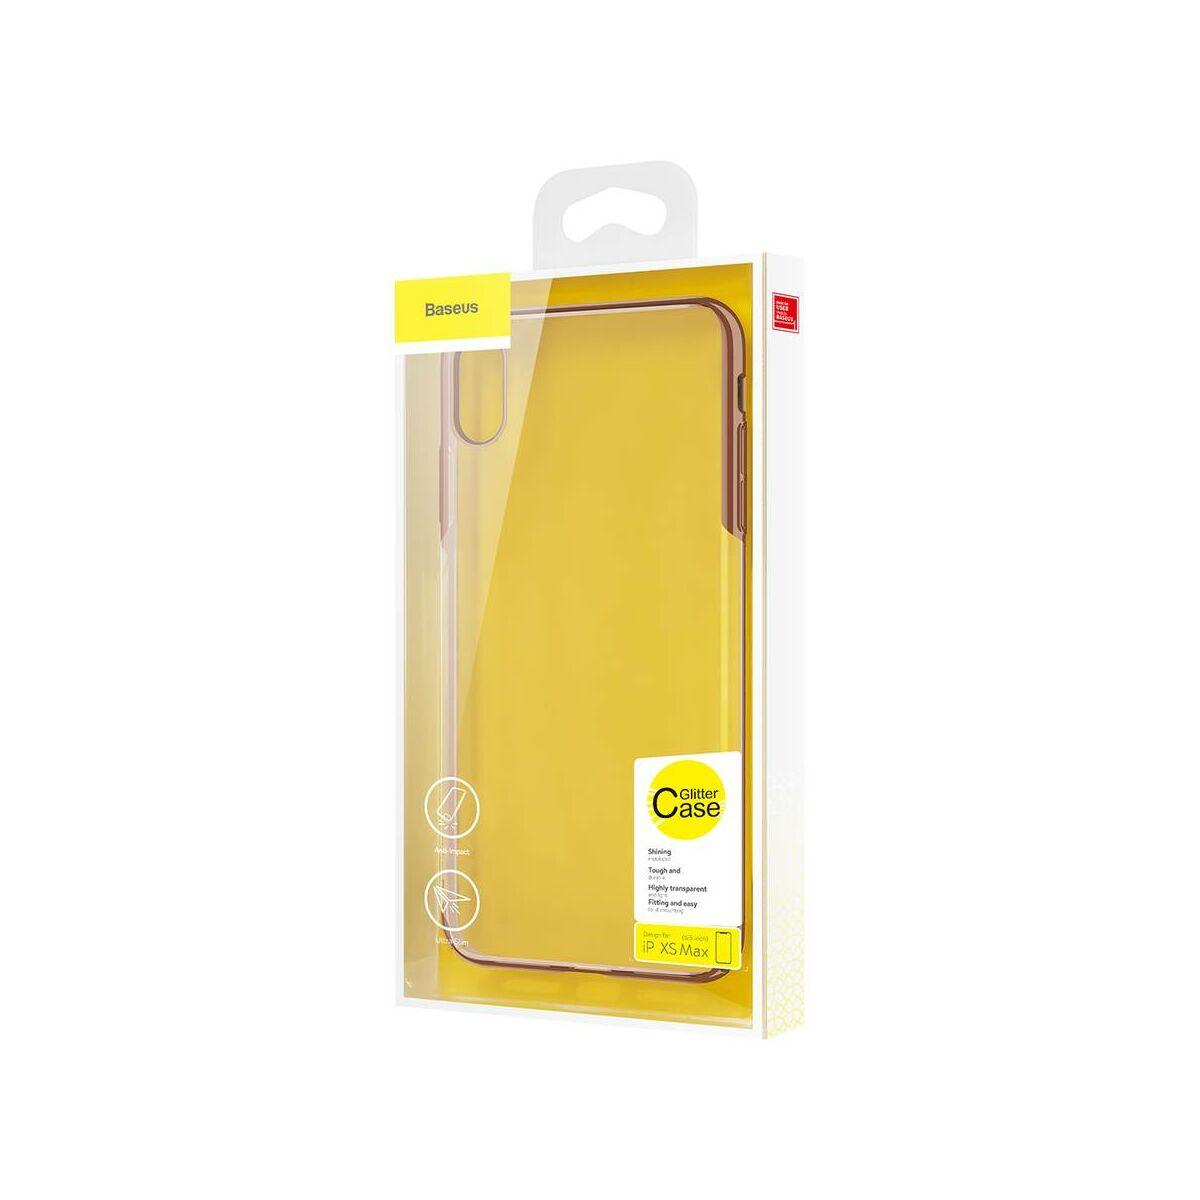 Baseus iPhone XS Max tok, Glitter, arany (WIAPIPH65-DW0V)